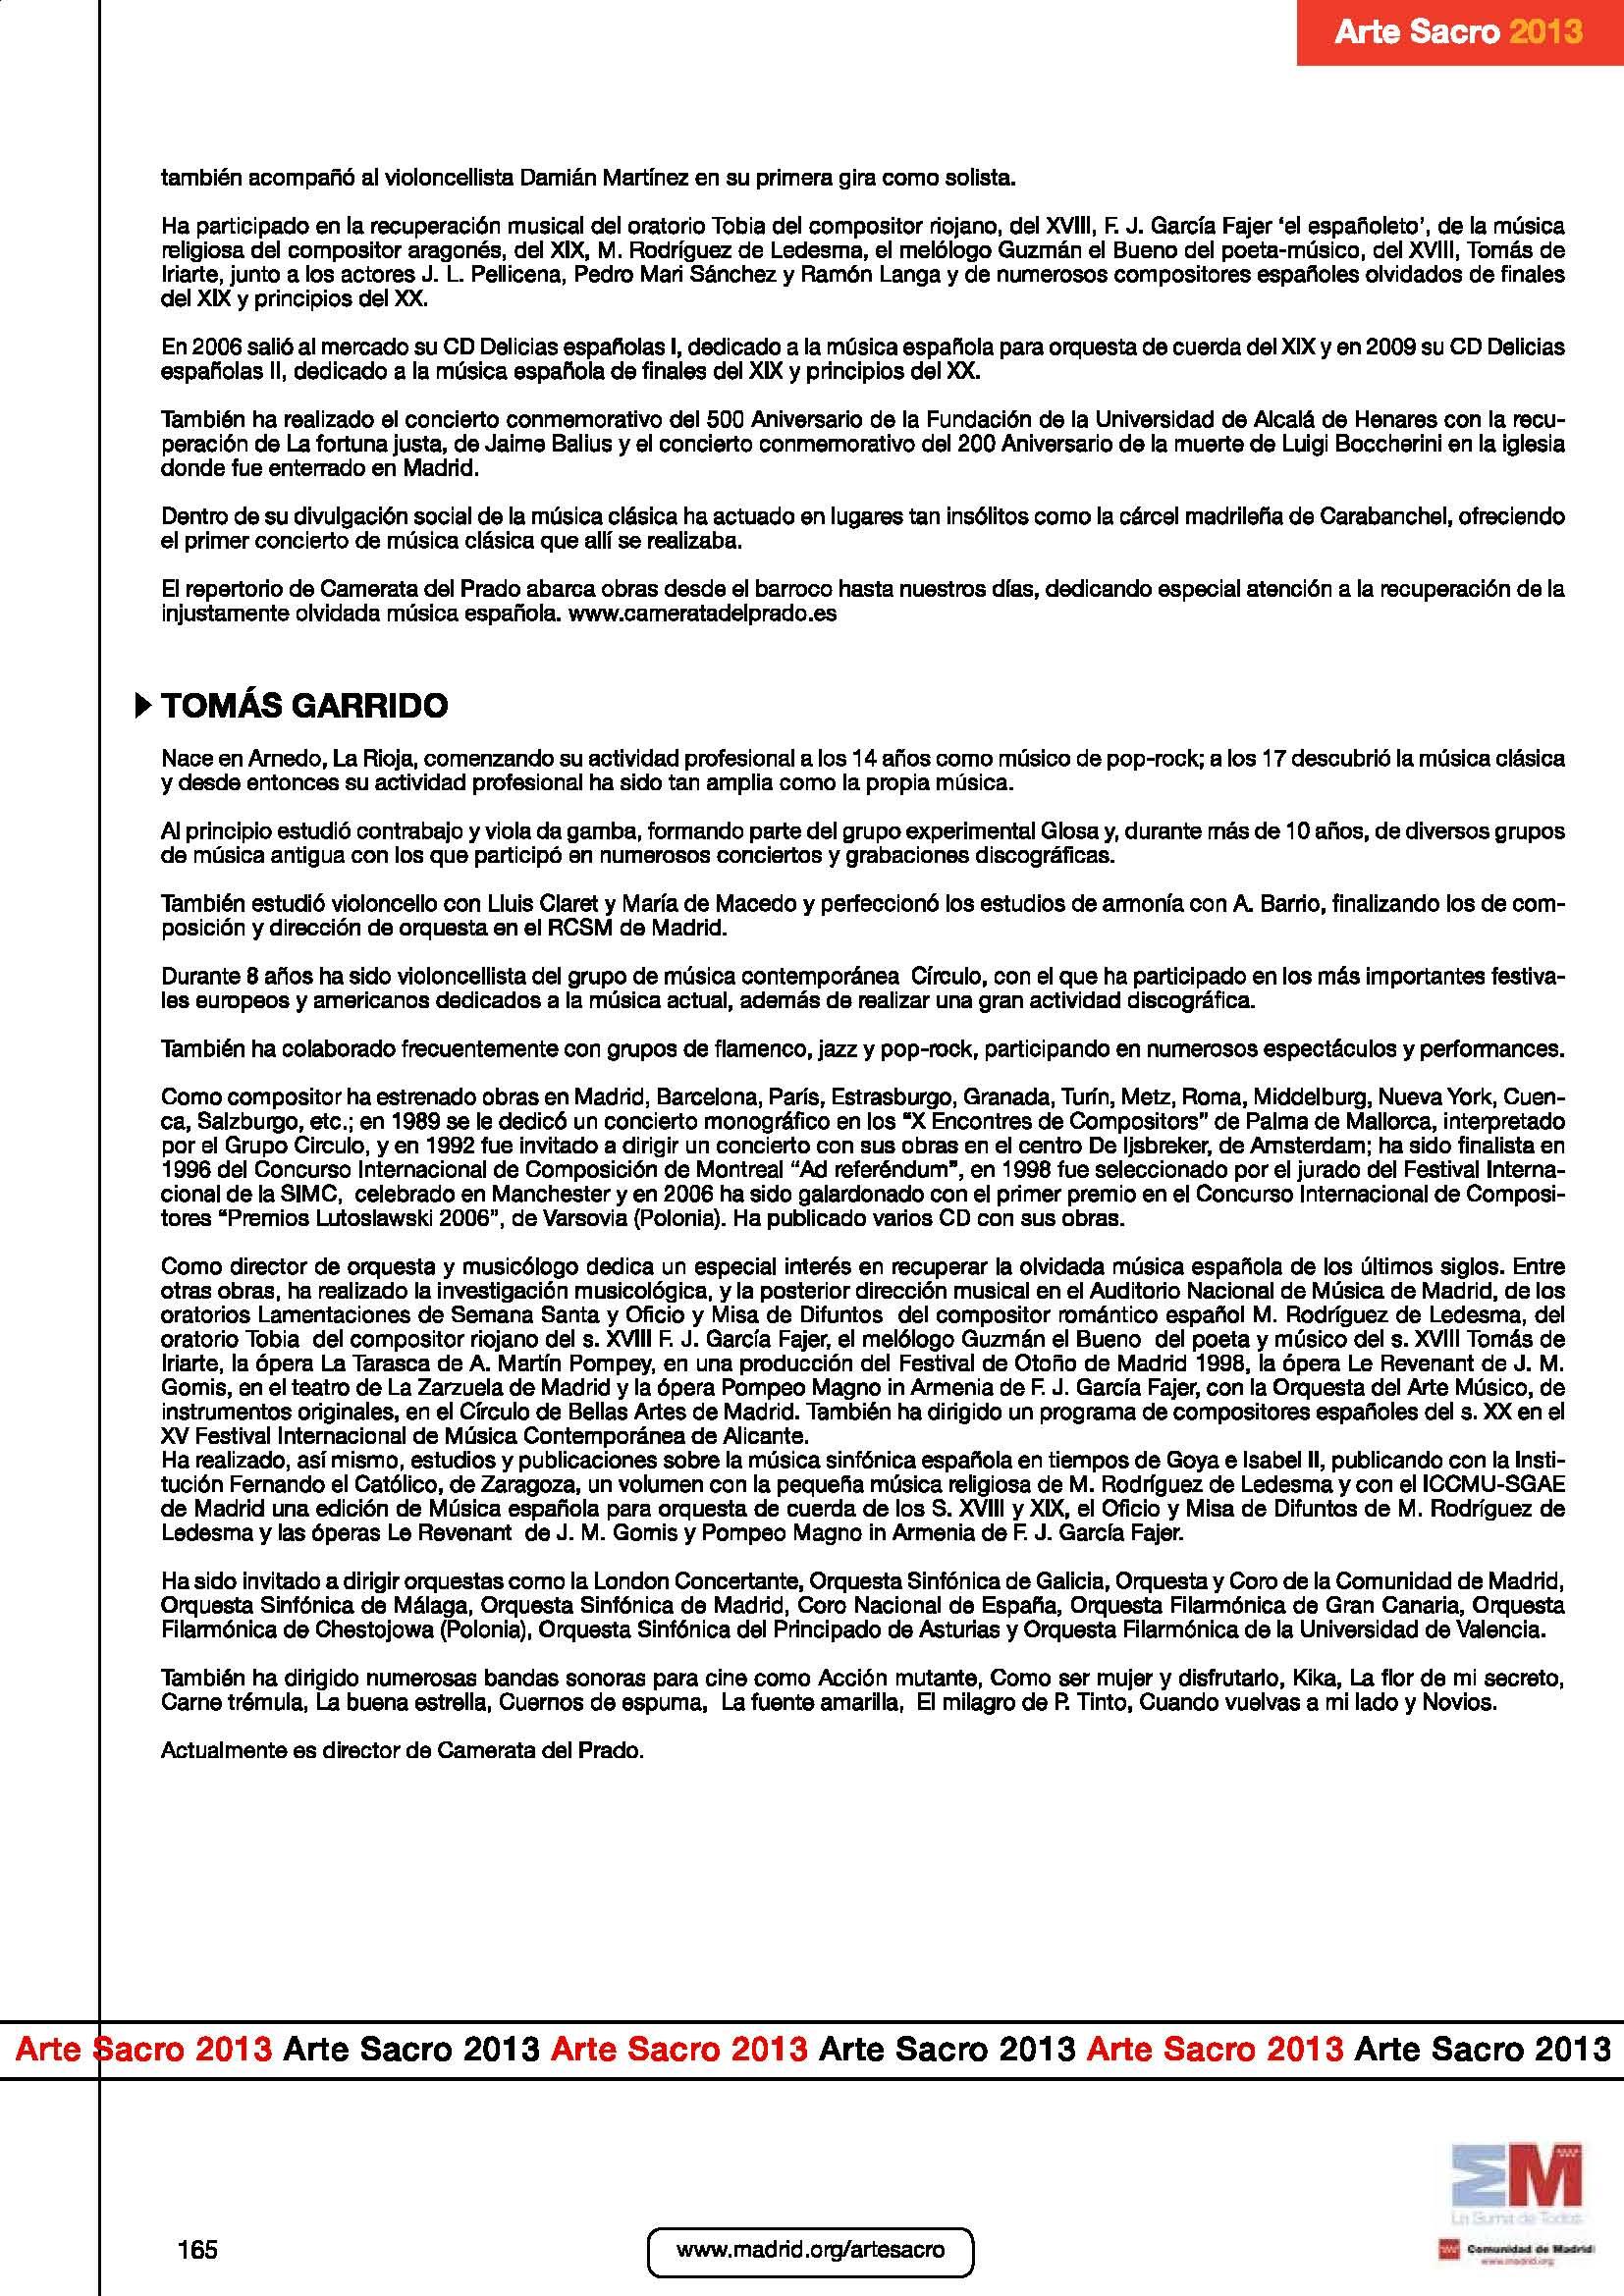 dossier_completo_Página_165